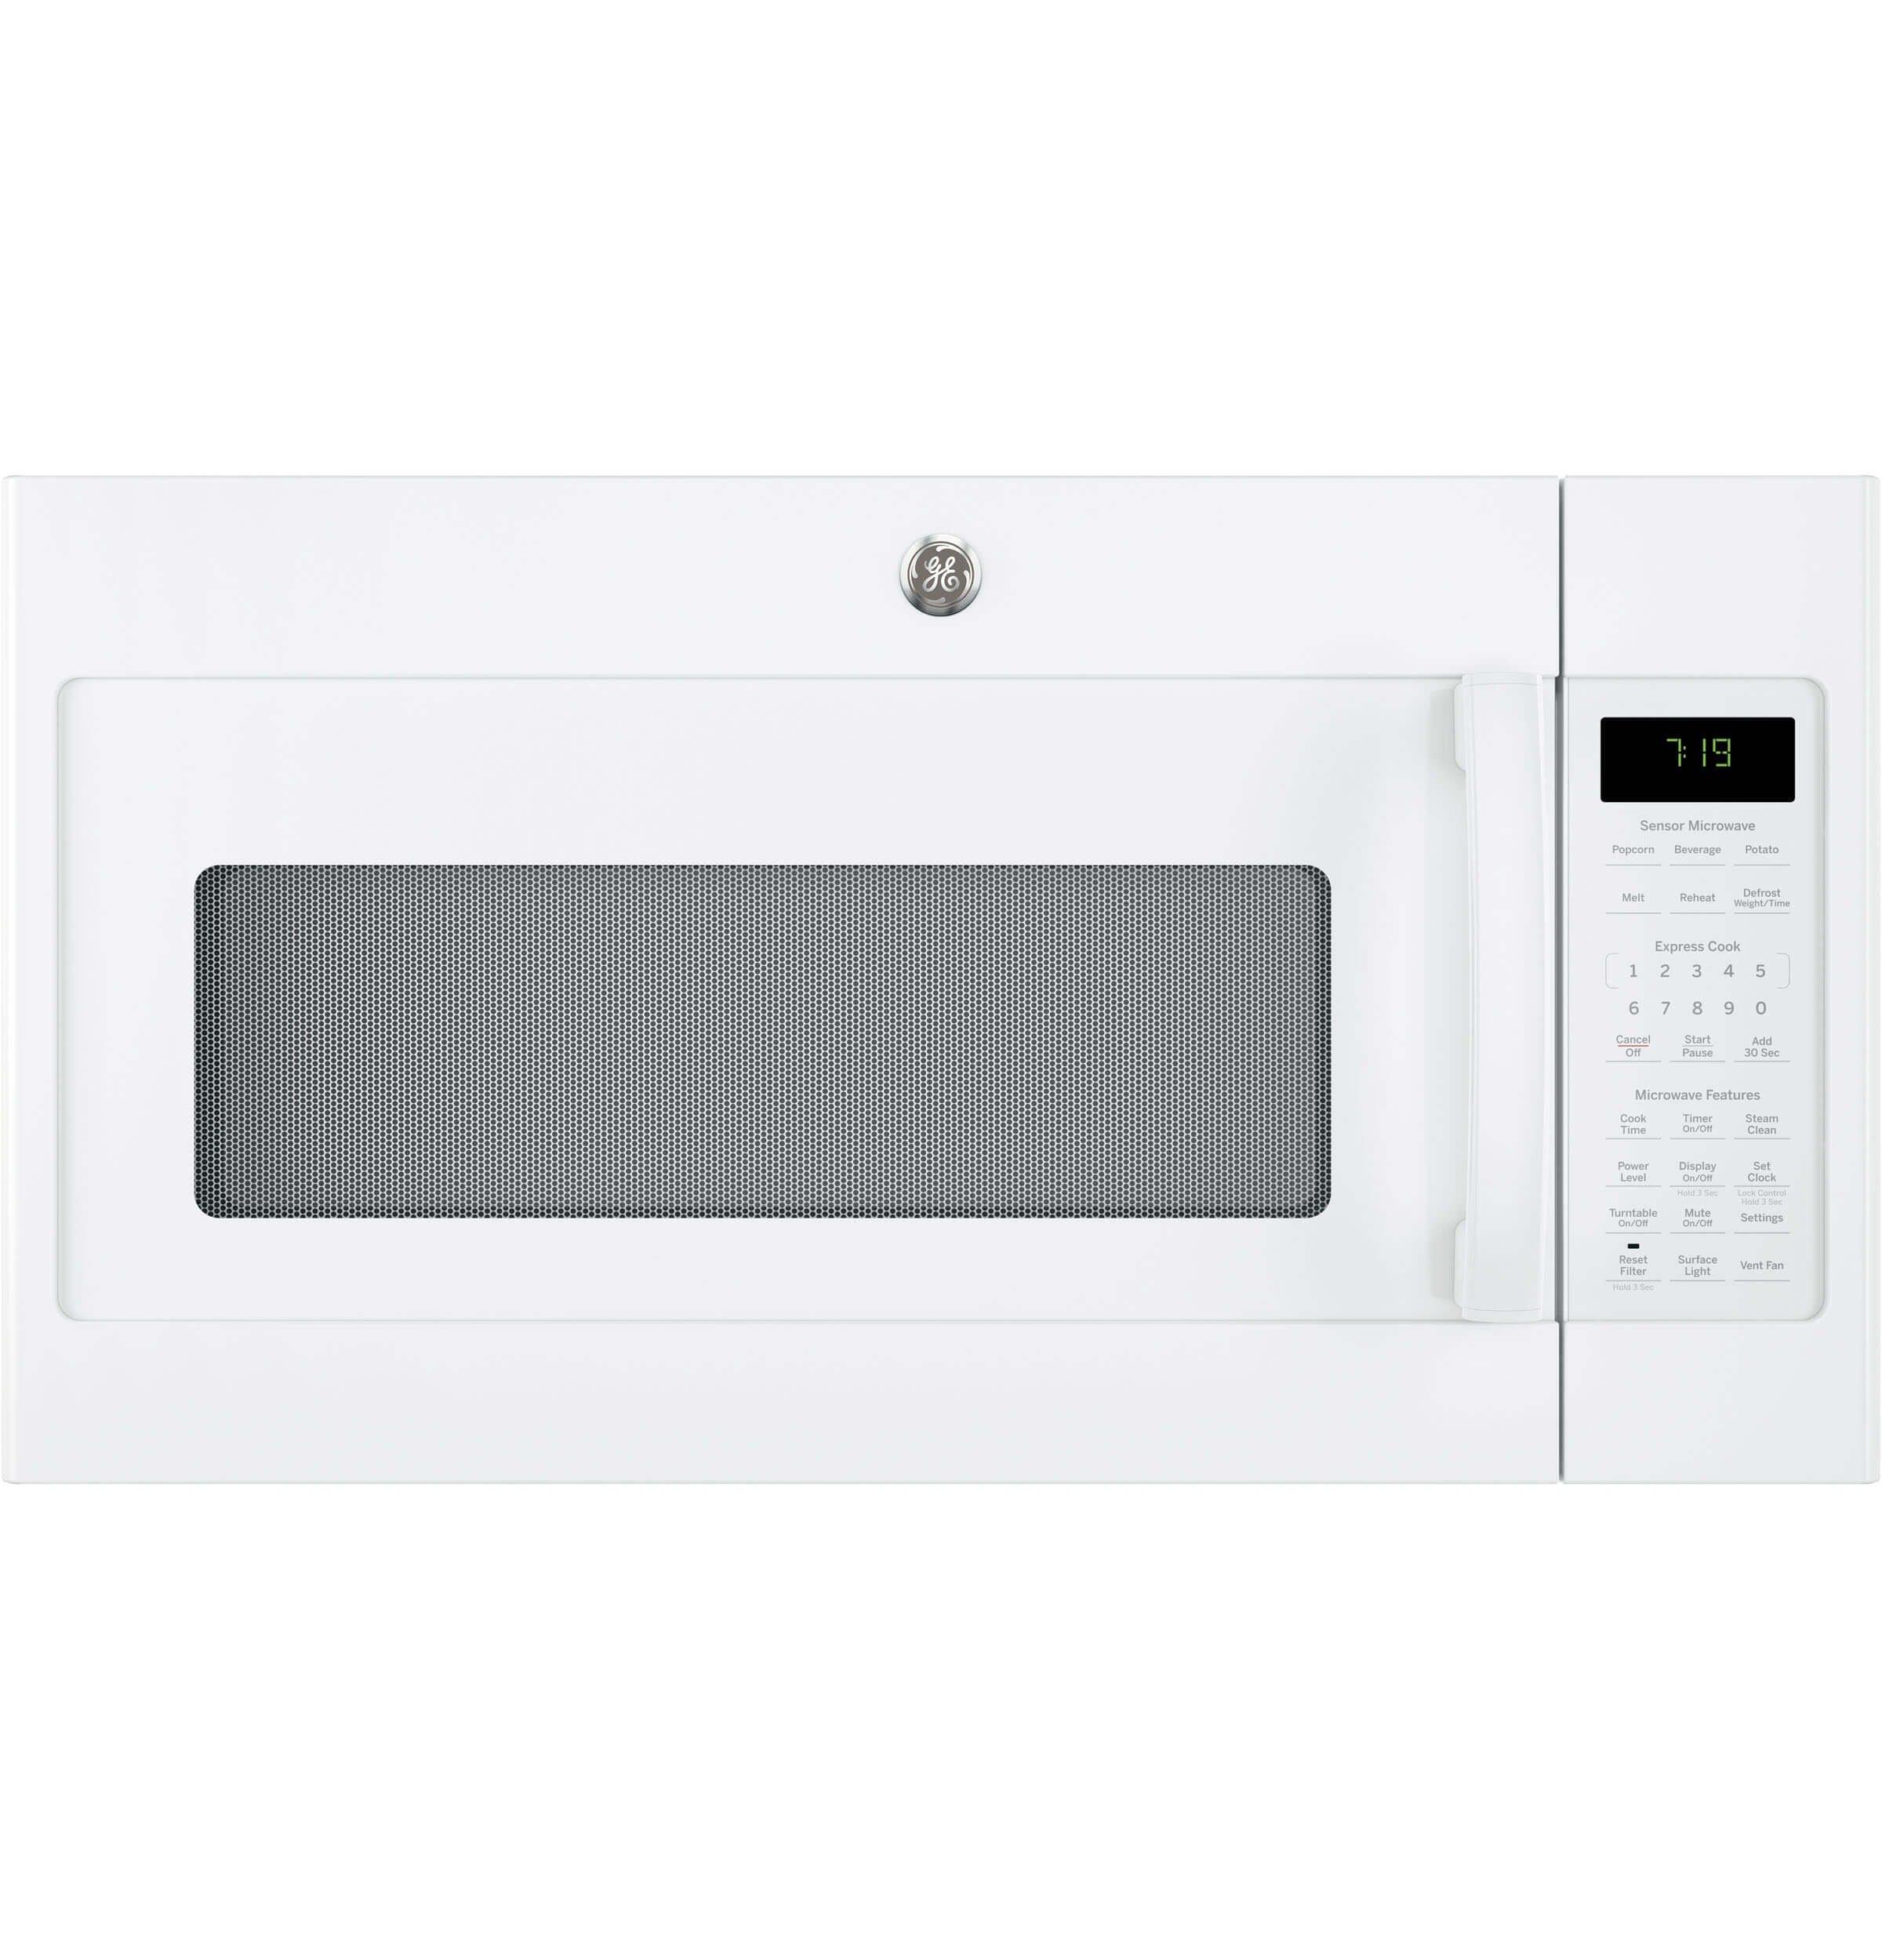 GE JNM7196DKWW Microwave Oven